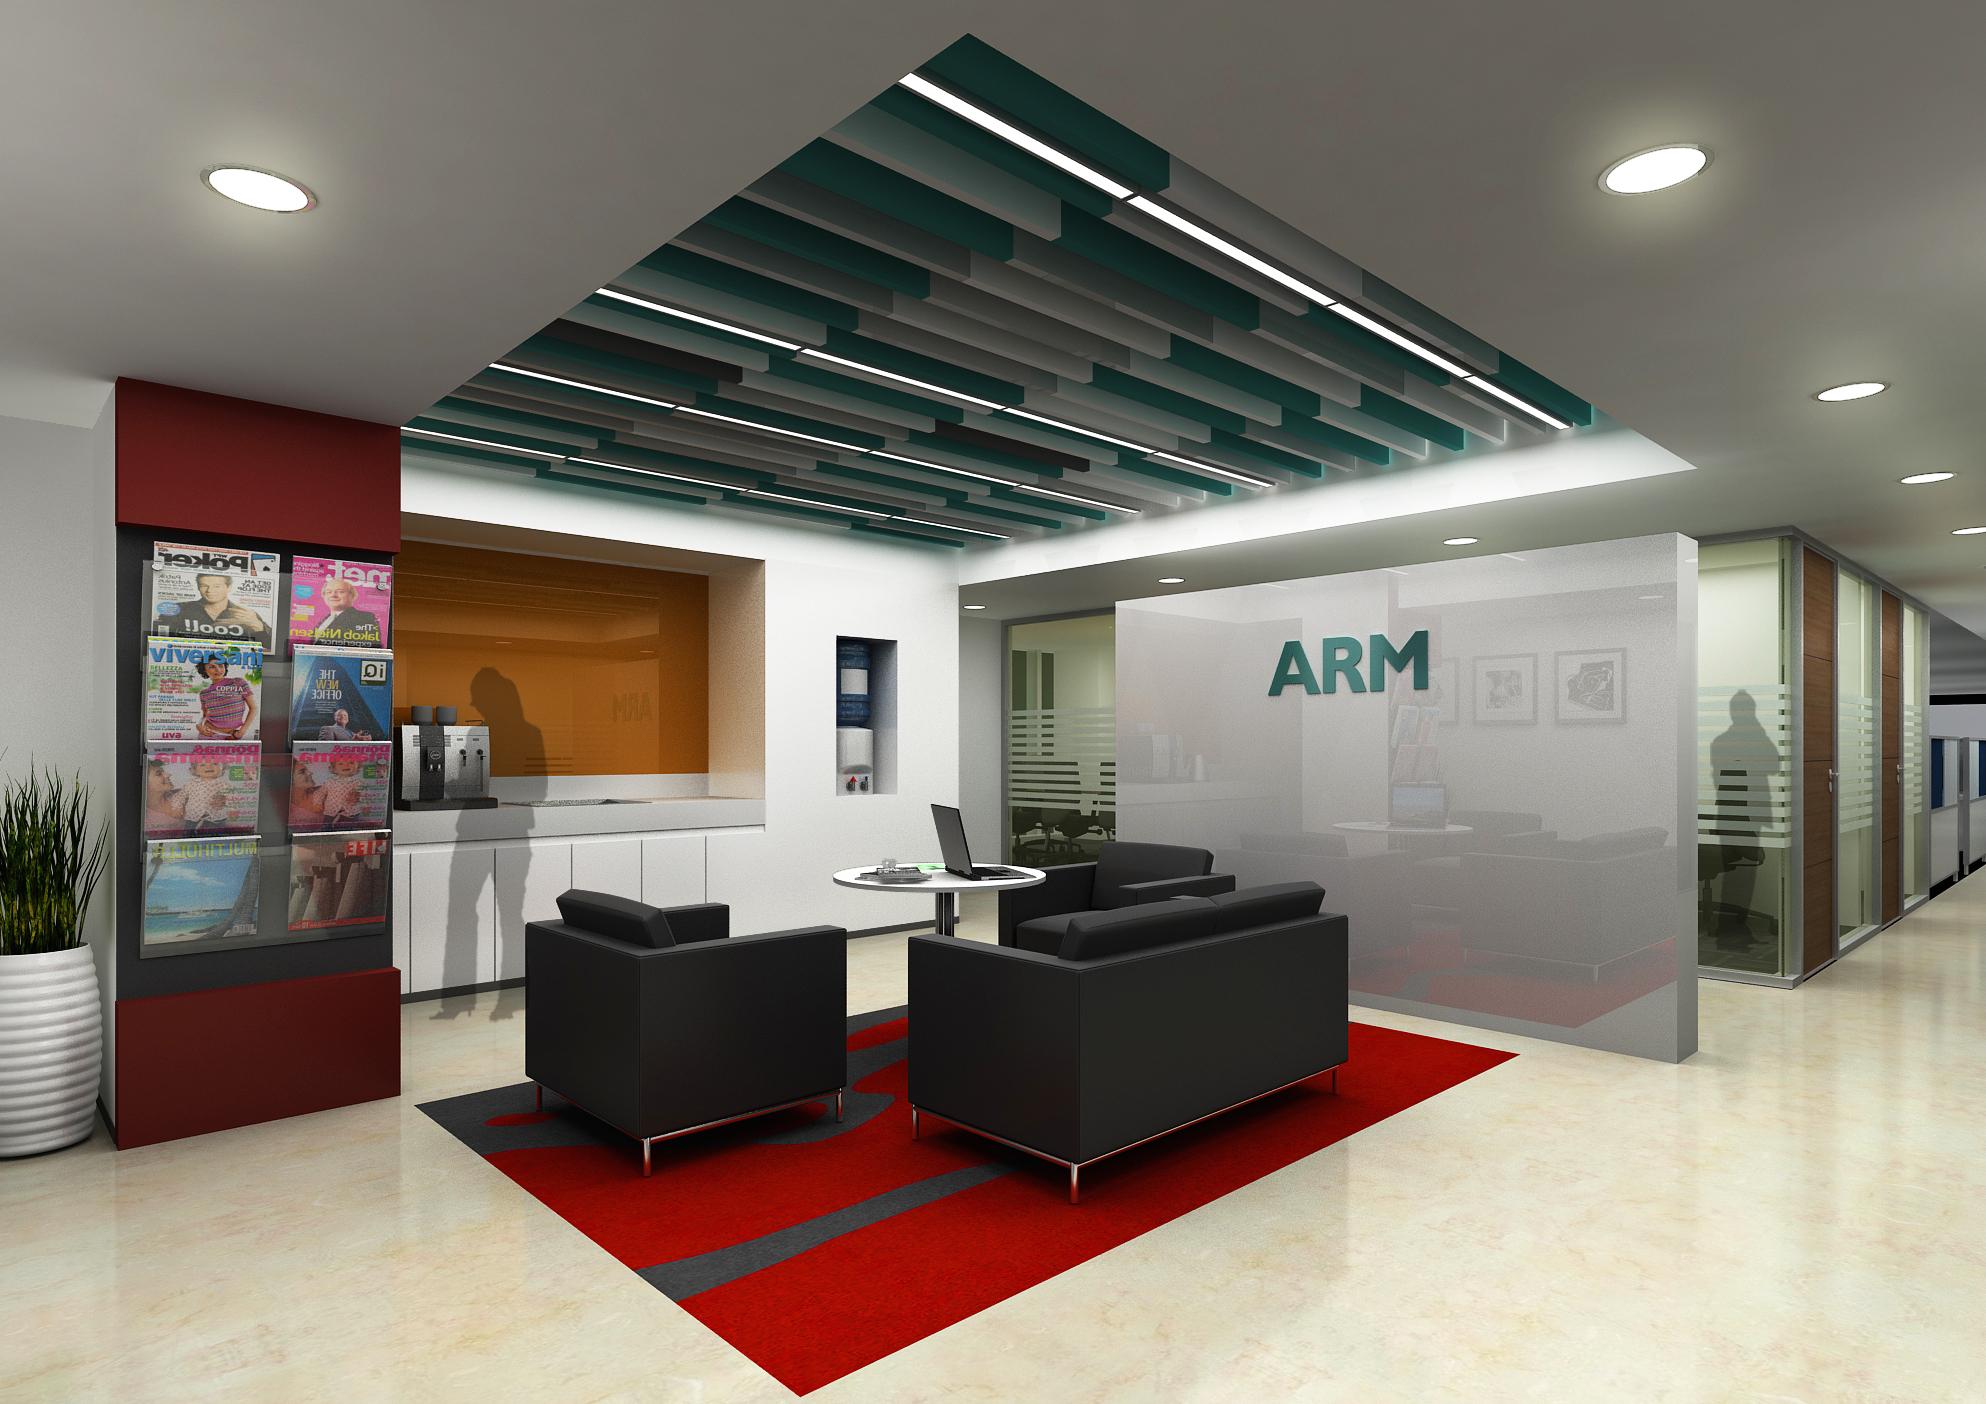 cam 01_entrance lobby copy